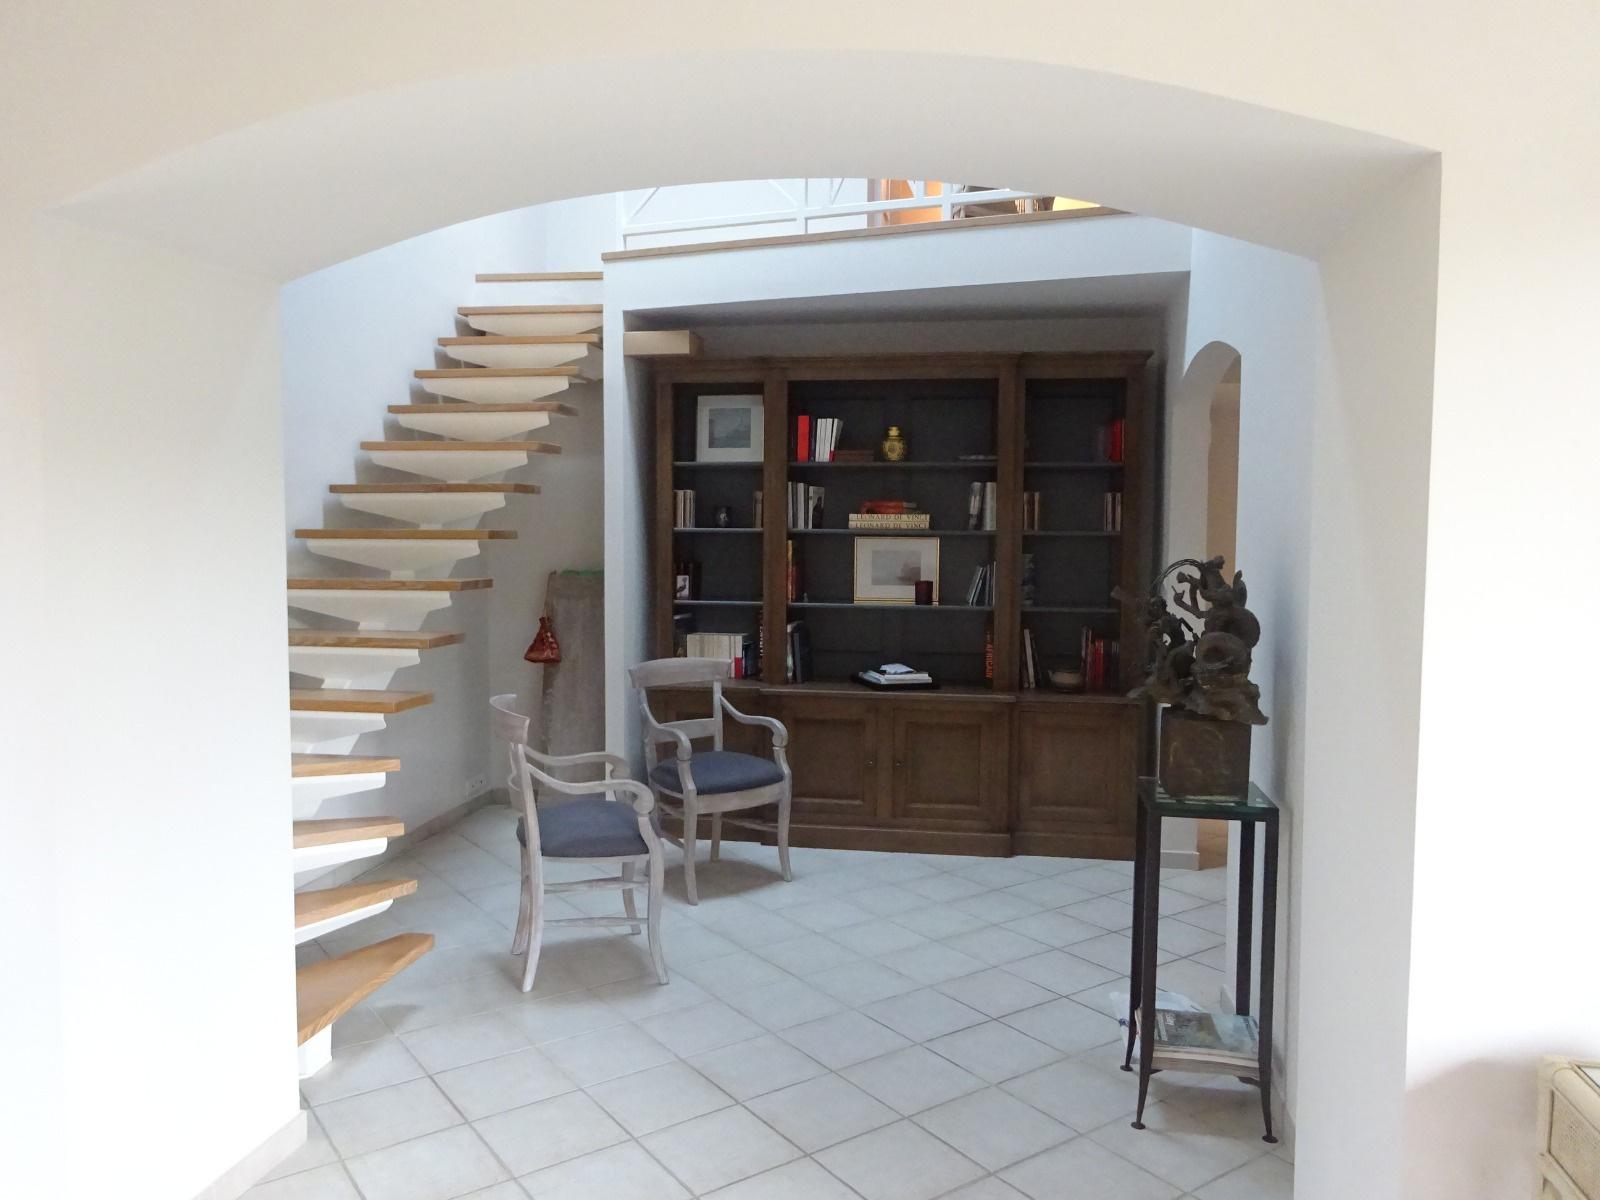 Image_6, Maison / villa, Saint-Cyr-sur-Mer, ref :30870